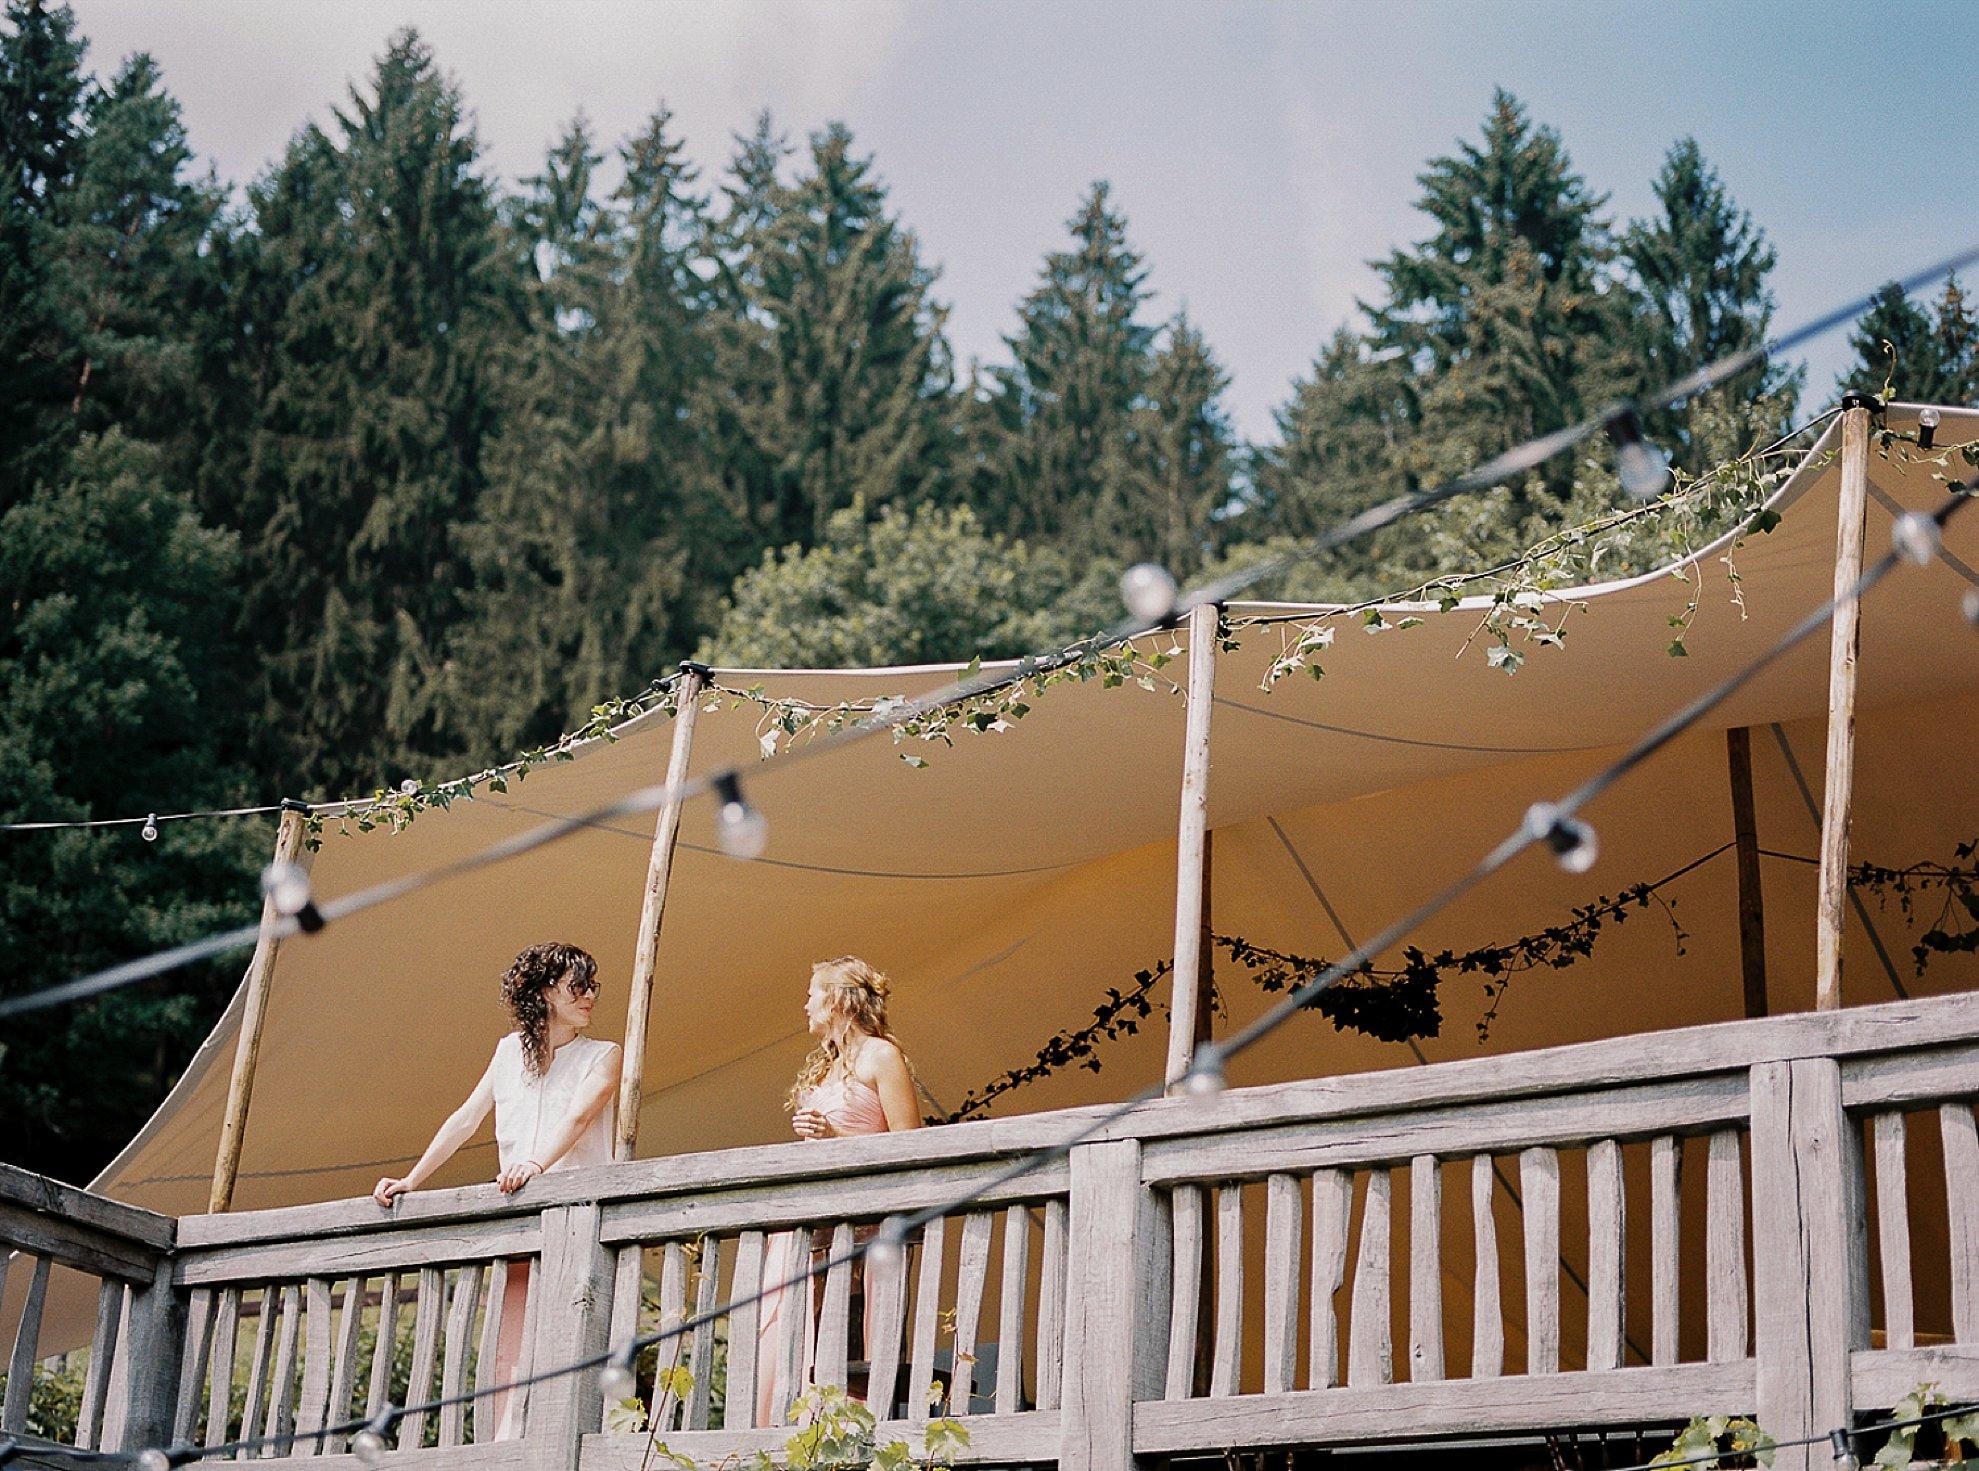 Amanda-Drost-Fotografie-Belgie-Photography-Wedding_0013.jpg